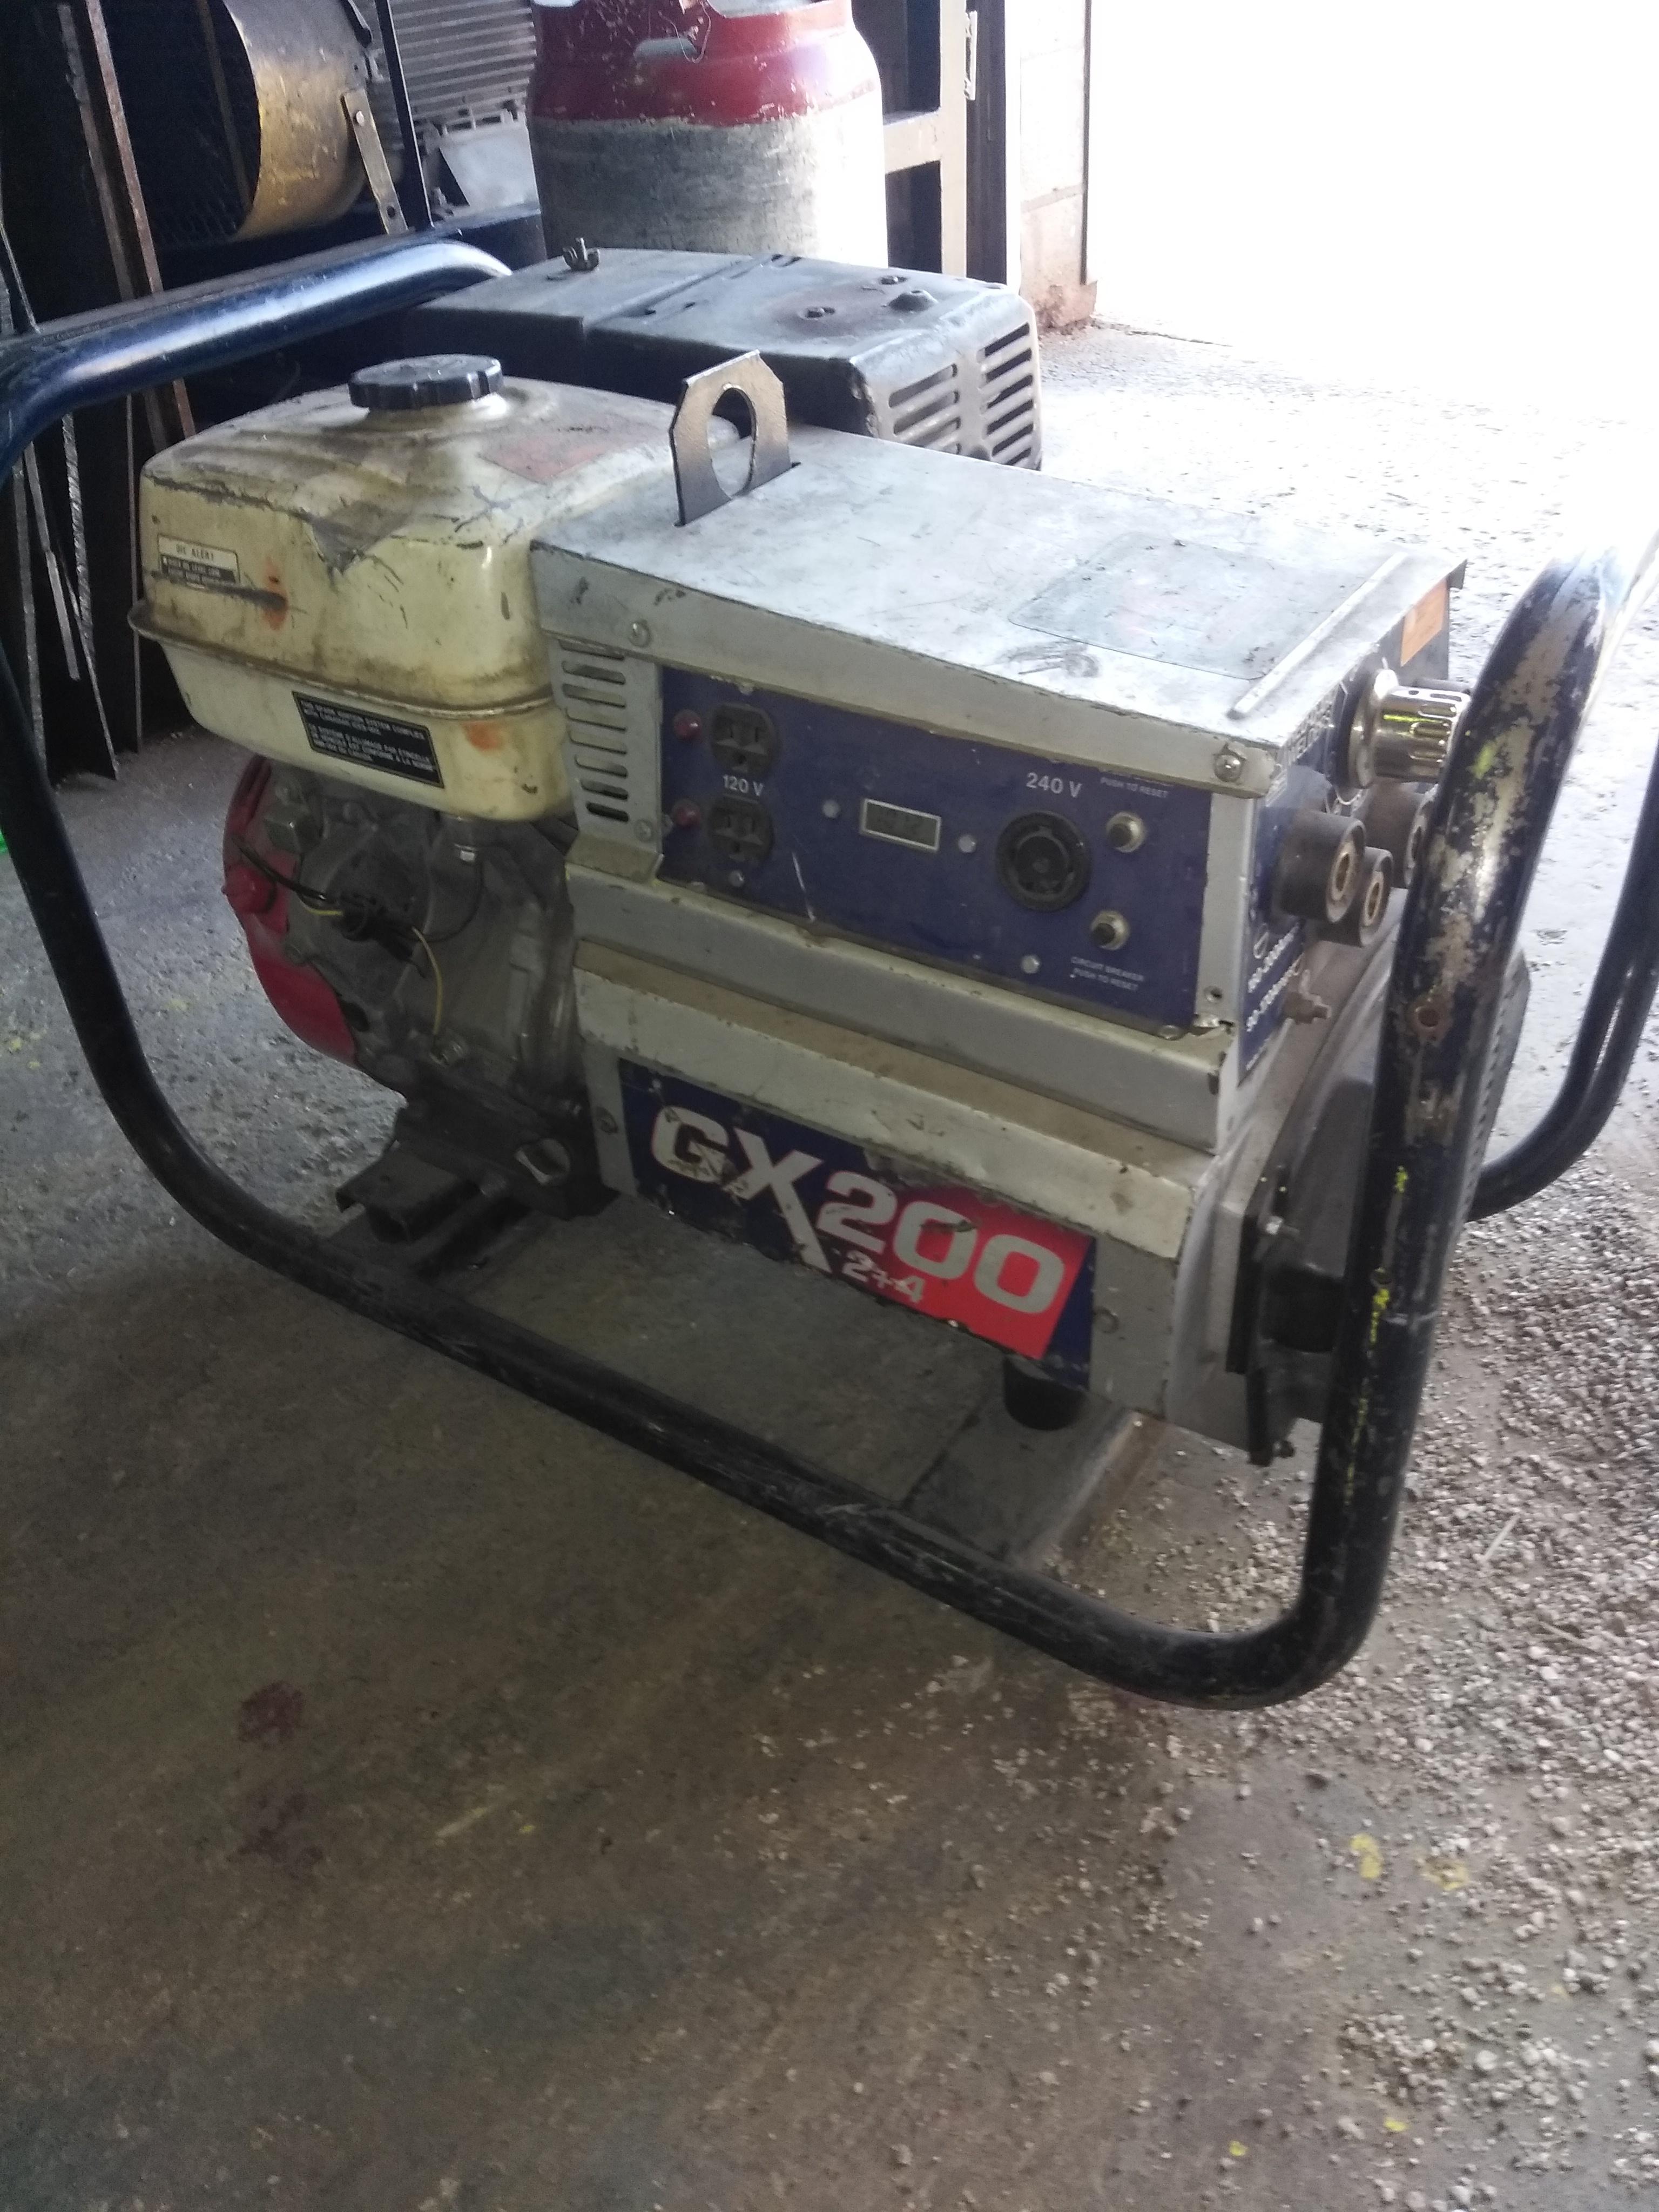 GX 200 RED-D-ARC Welder Quantity: 2 Cost: $1800 / each